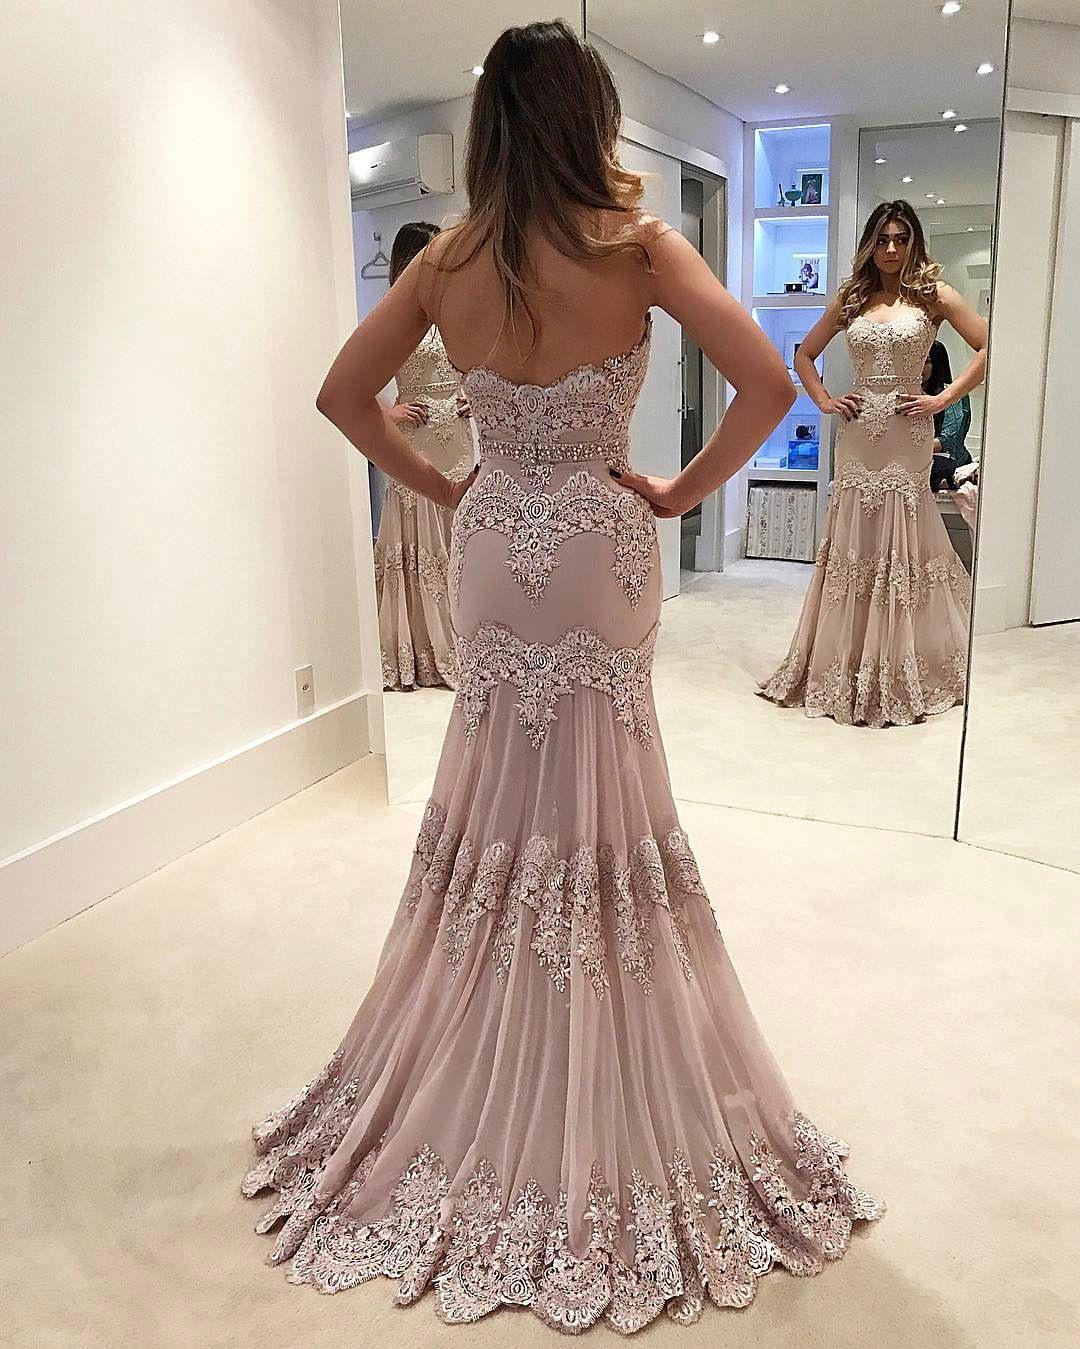 15 Fantastisch Abendkleider Lang Online Shop BoutiqueDesigner Coolste Abendkleider Lang Online Shop Bester Preis